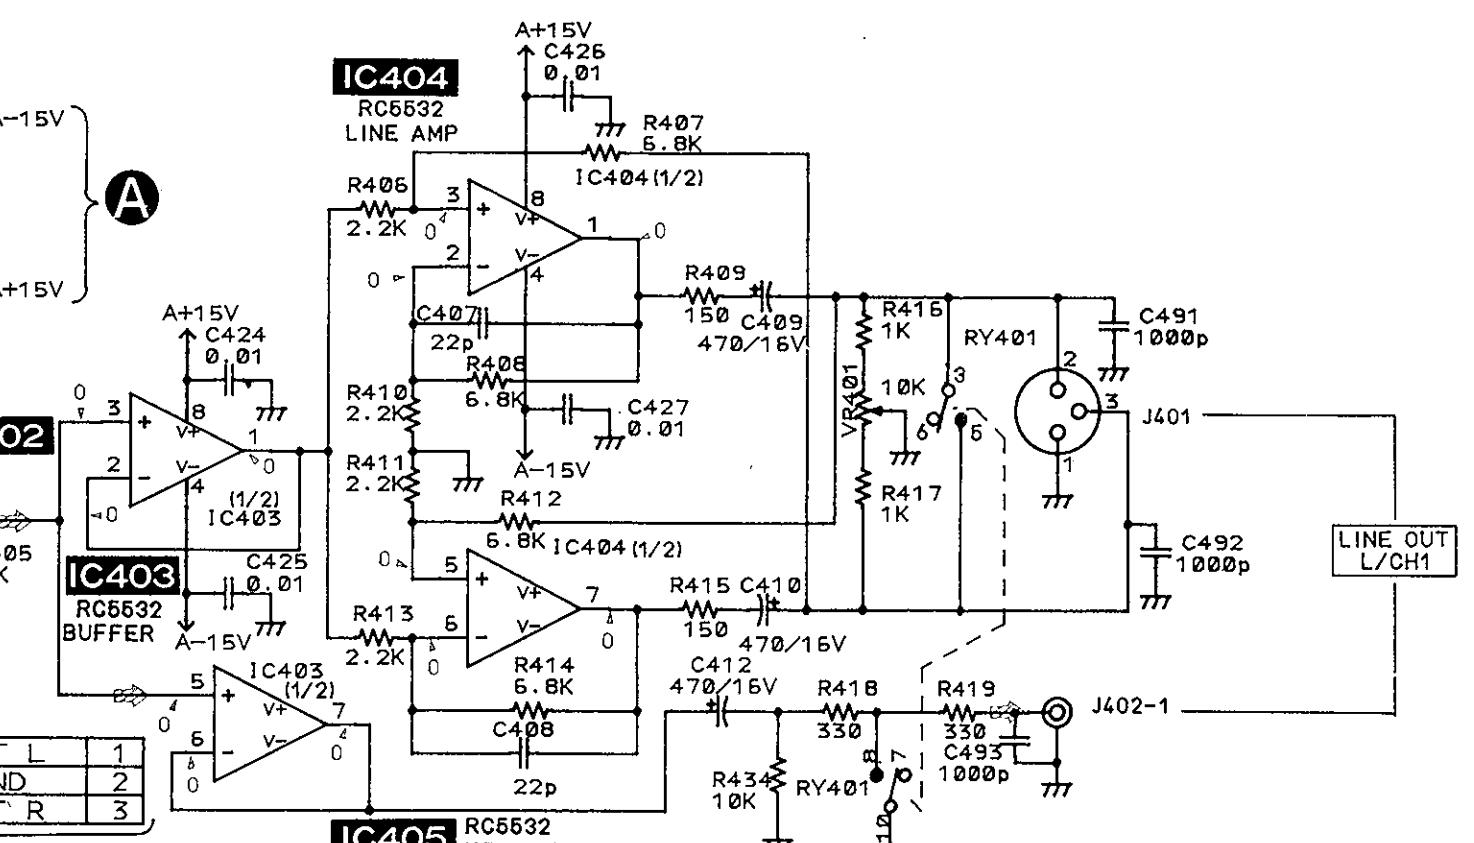 medium resolution of sony cd player wiring diagram imageresizertool com balanced xlr wiring diagram balanced audio cable wiring diagram